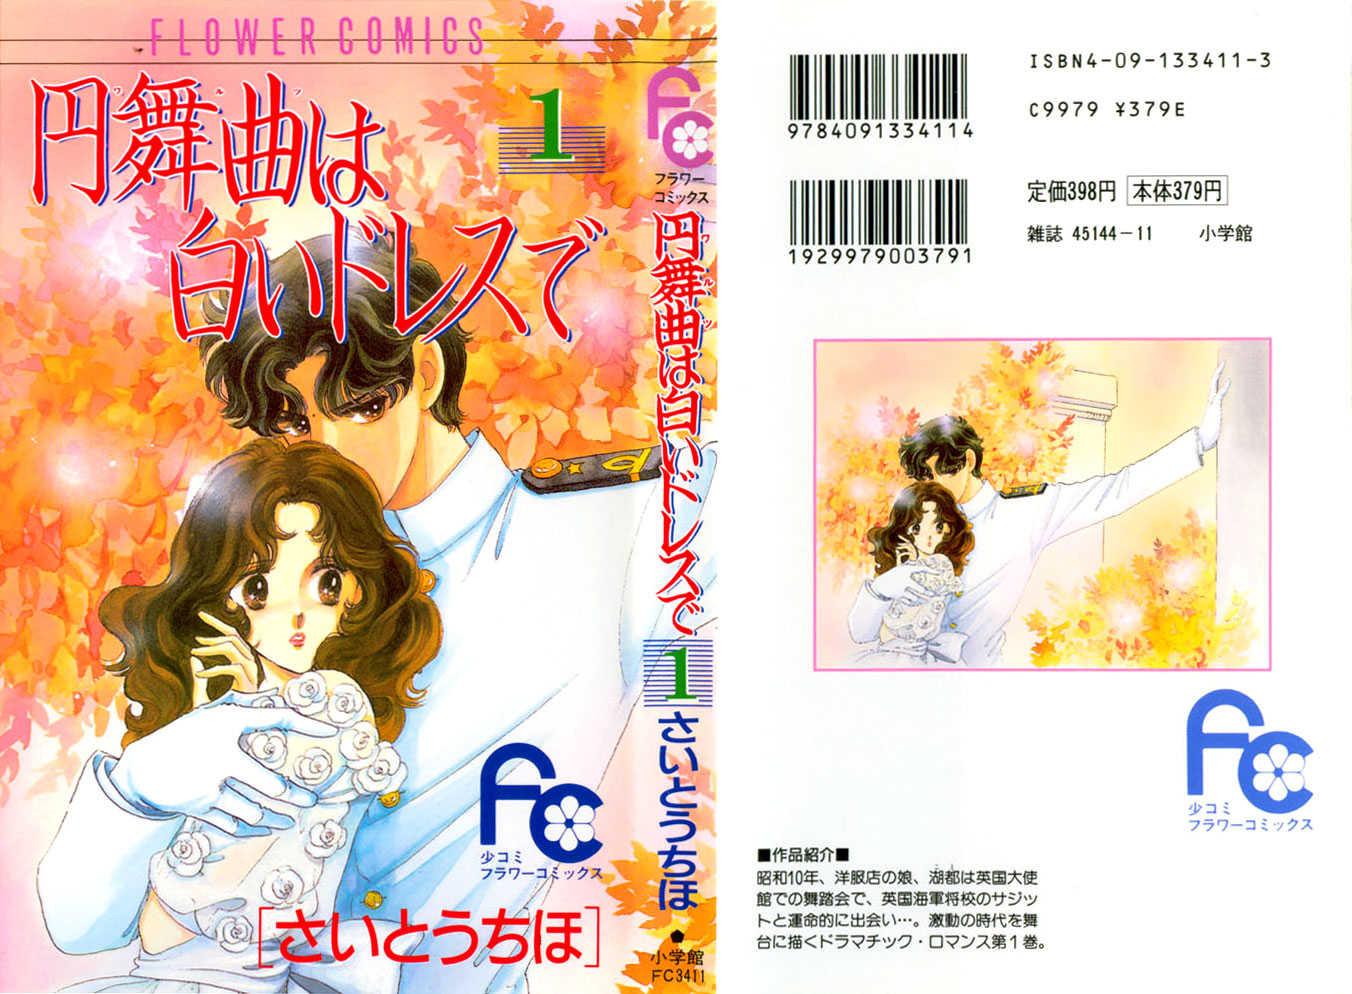 Waltz wa Shiroi Dress de 1 Page 1